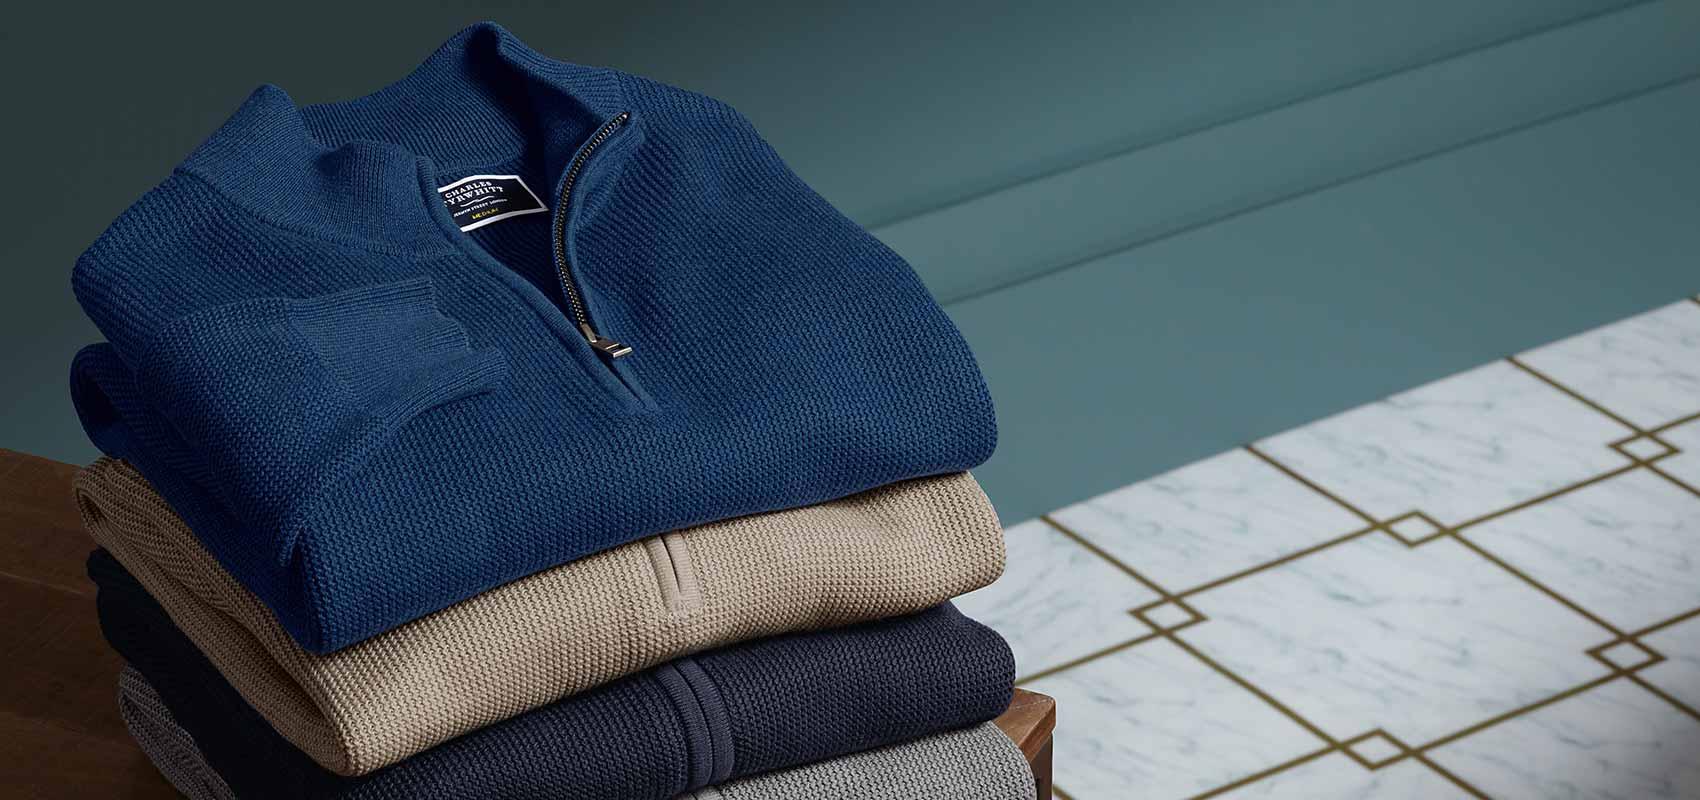 Charles Tyrwhitt knitwear